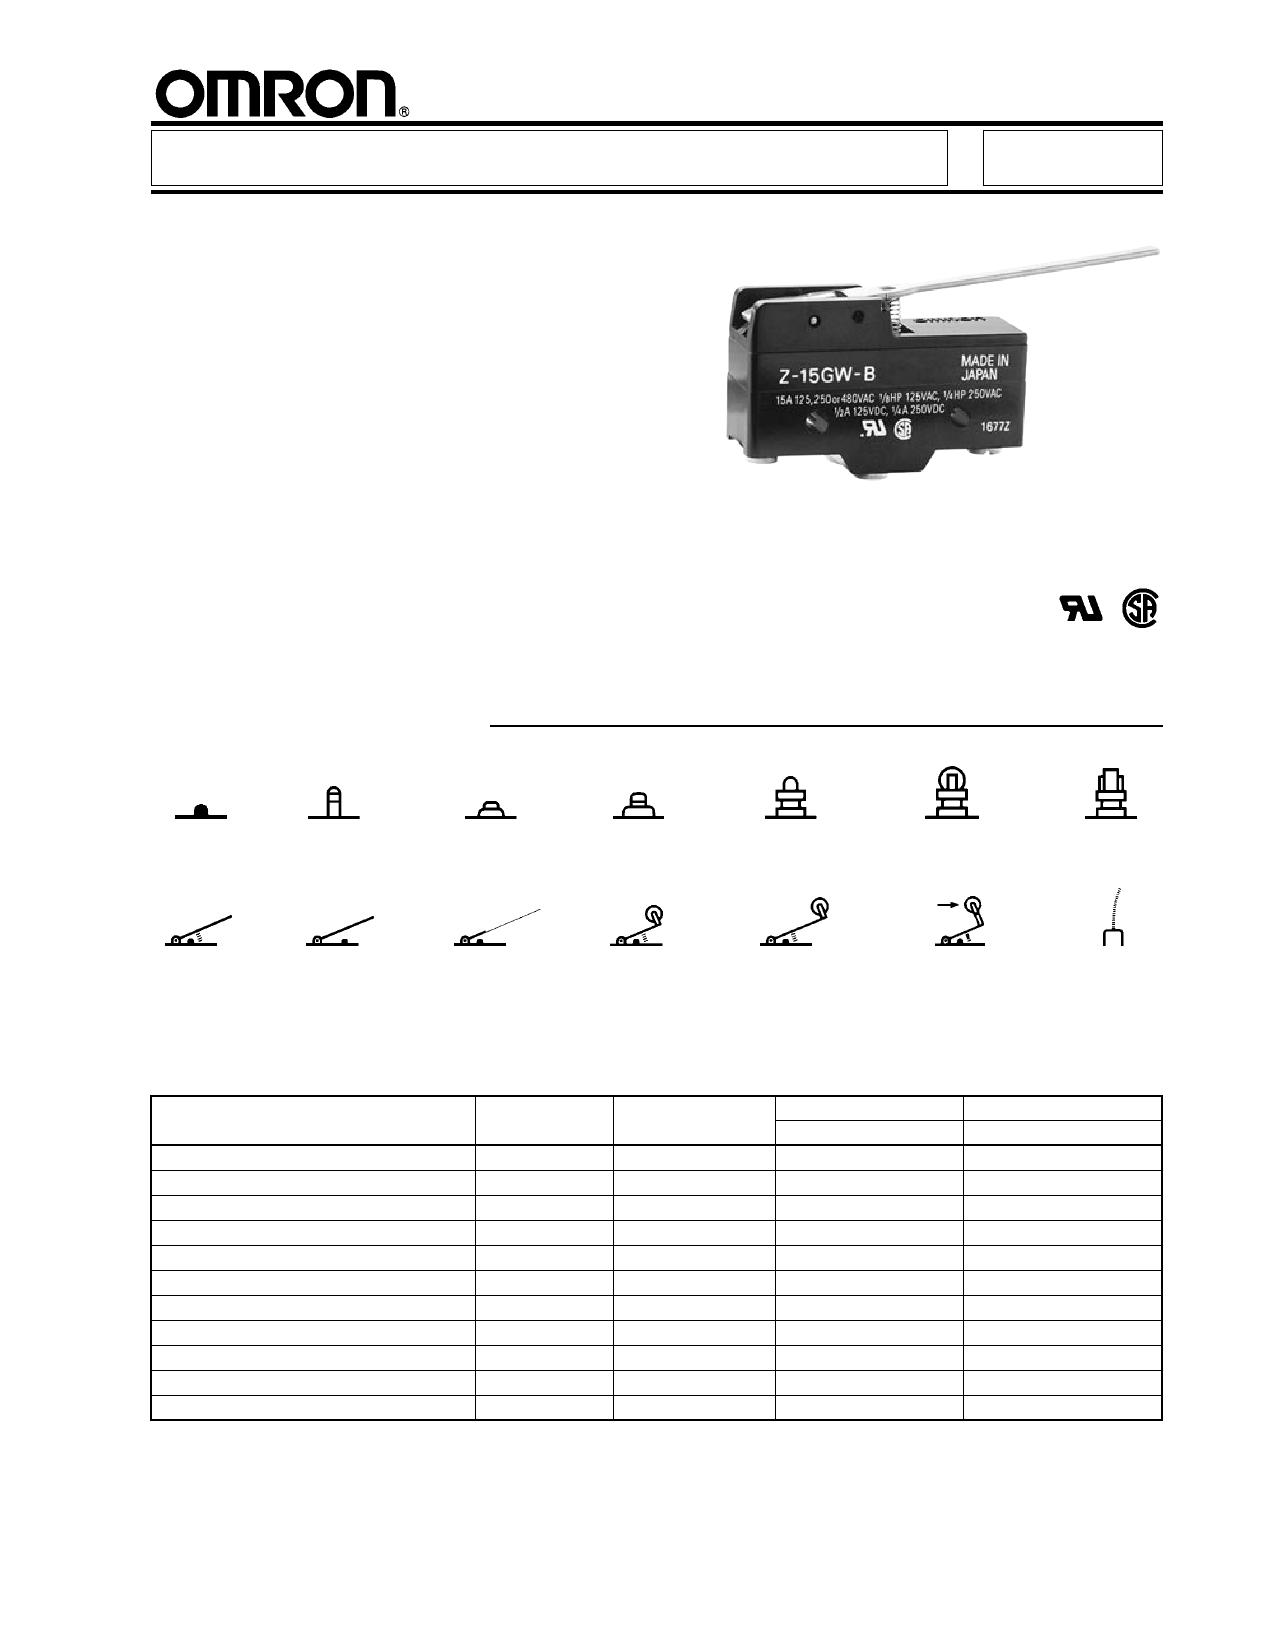 Z-15GW4-B datasheet